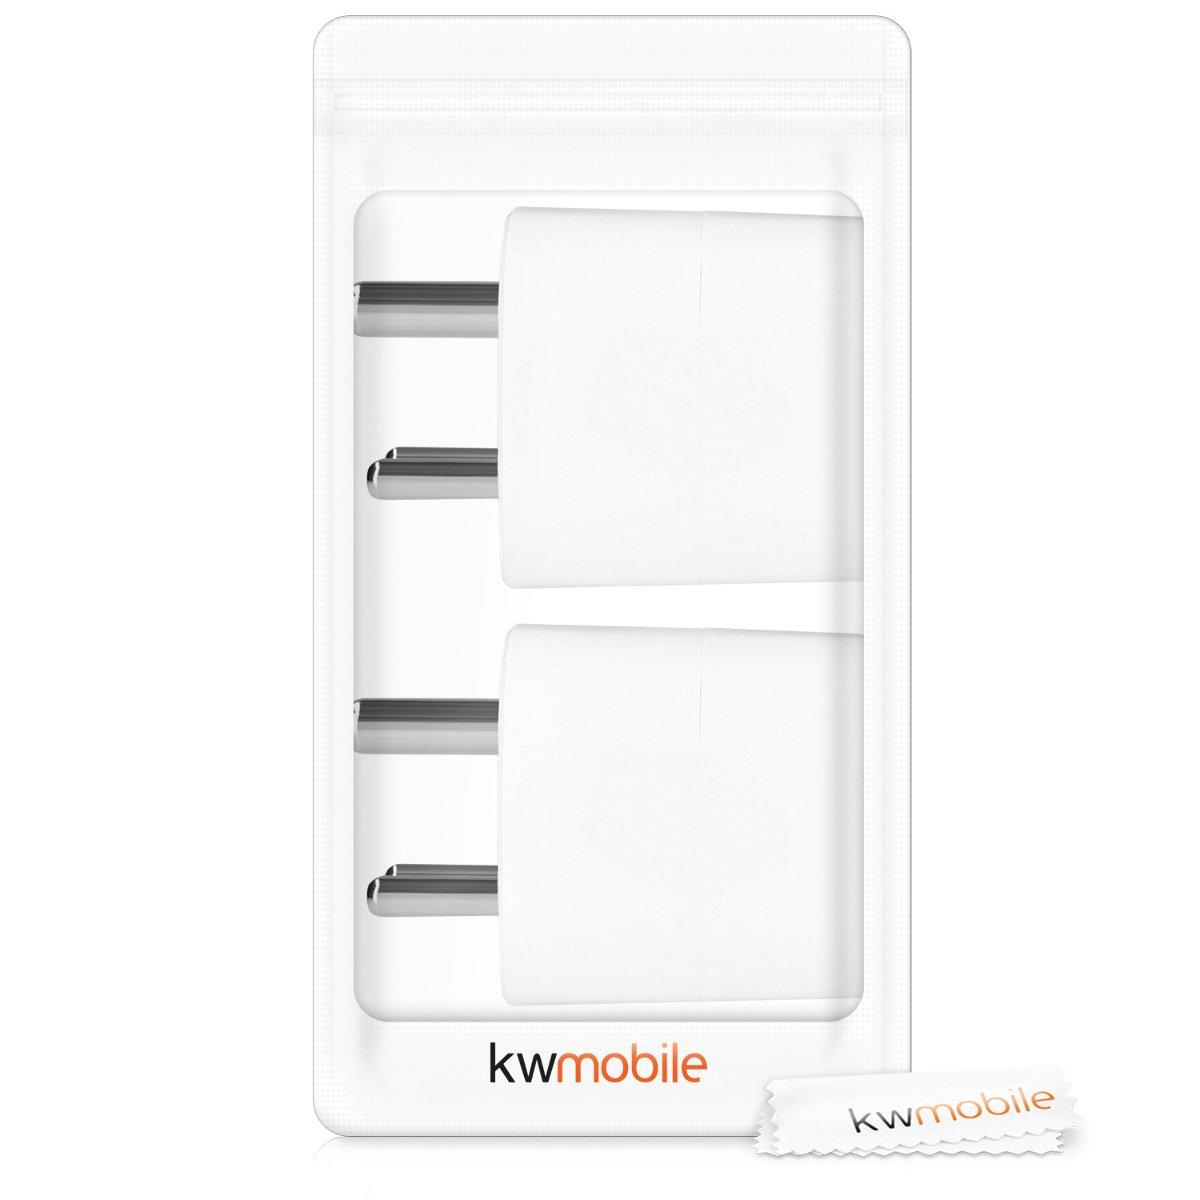 kwmobile 2 Adaptadores de Viaje para India Tipo D: Amazon.es: Electrónica